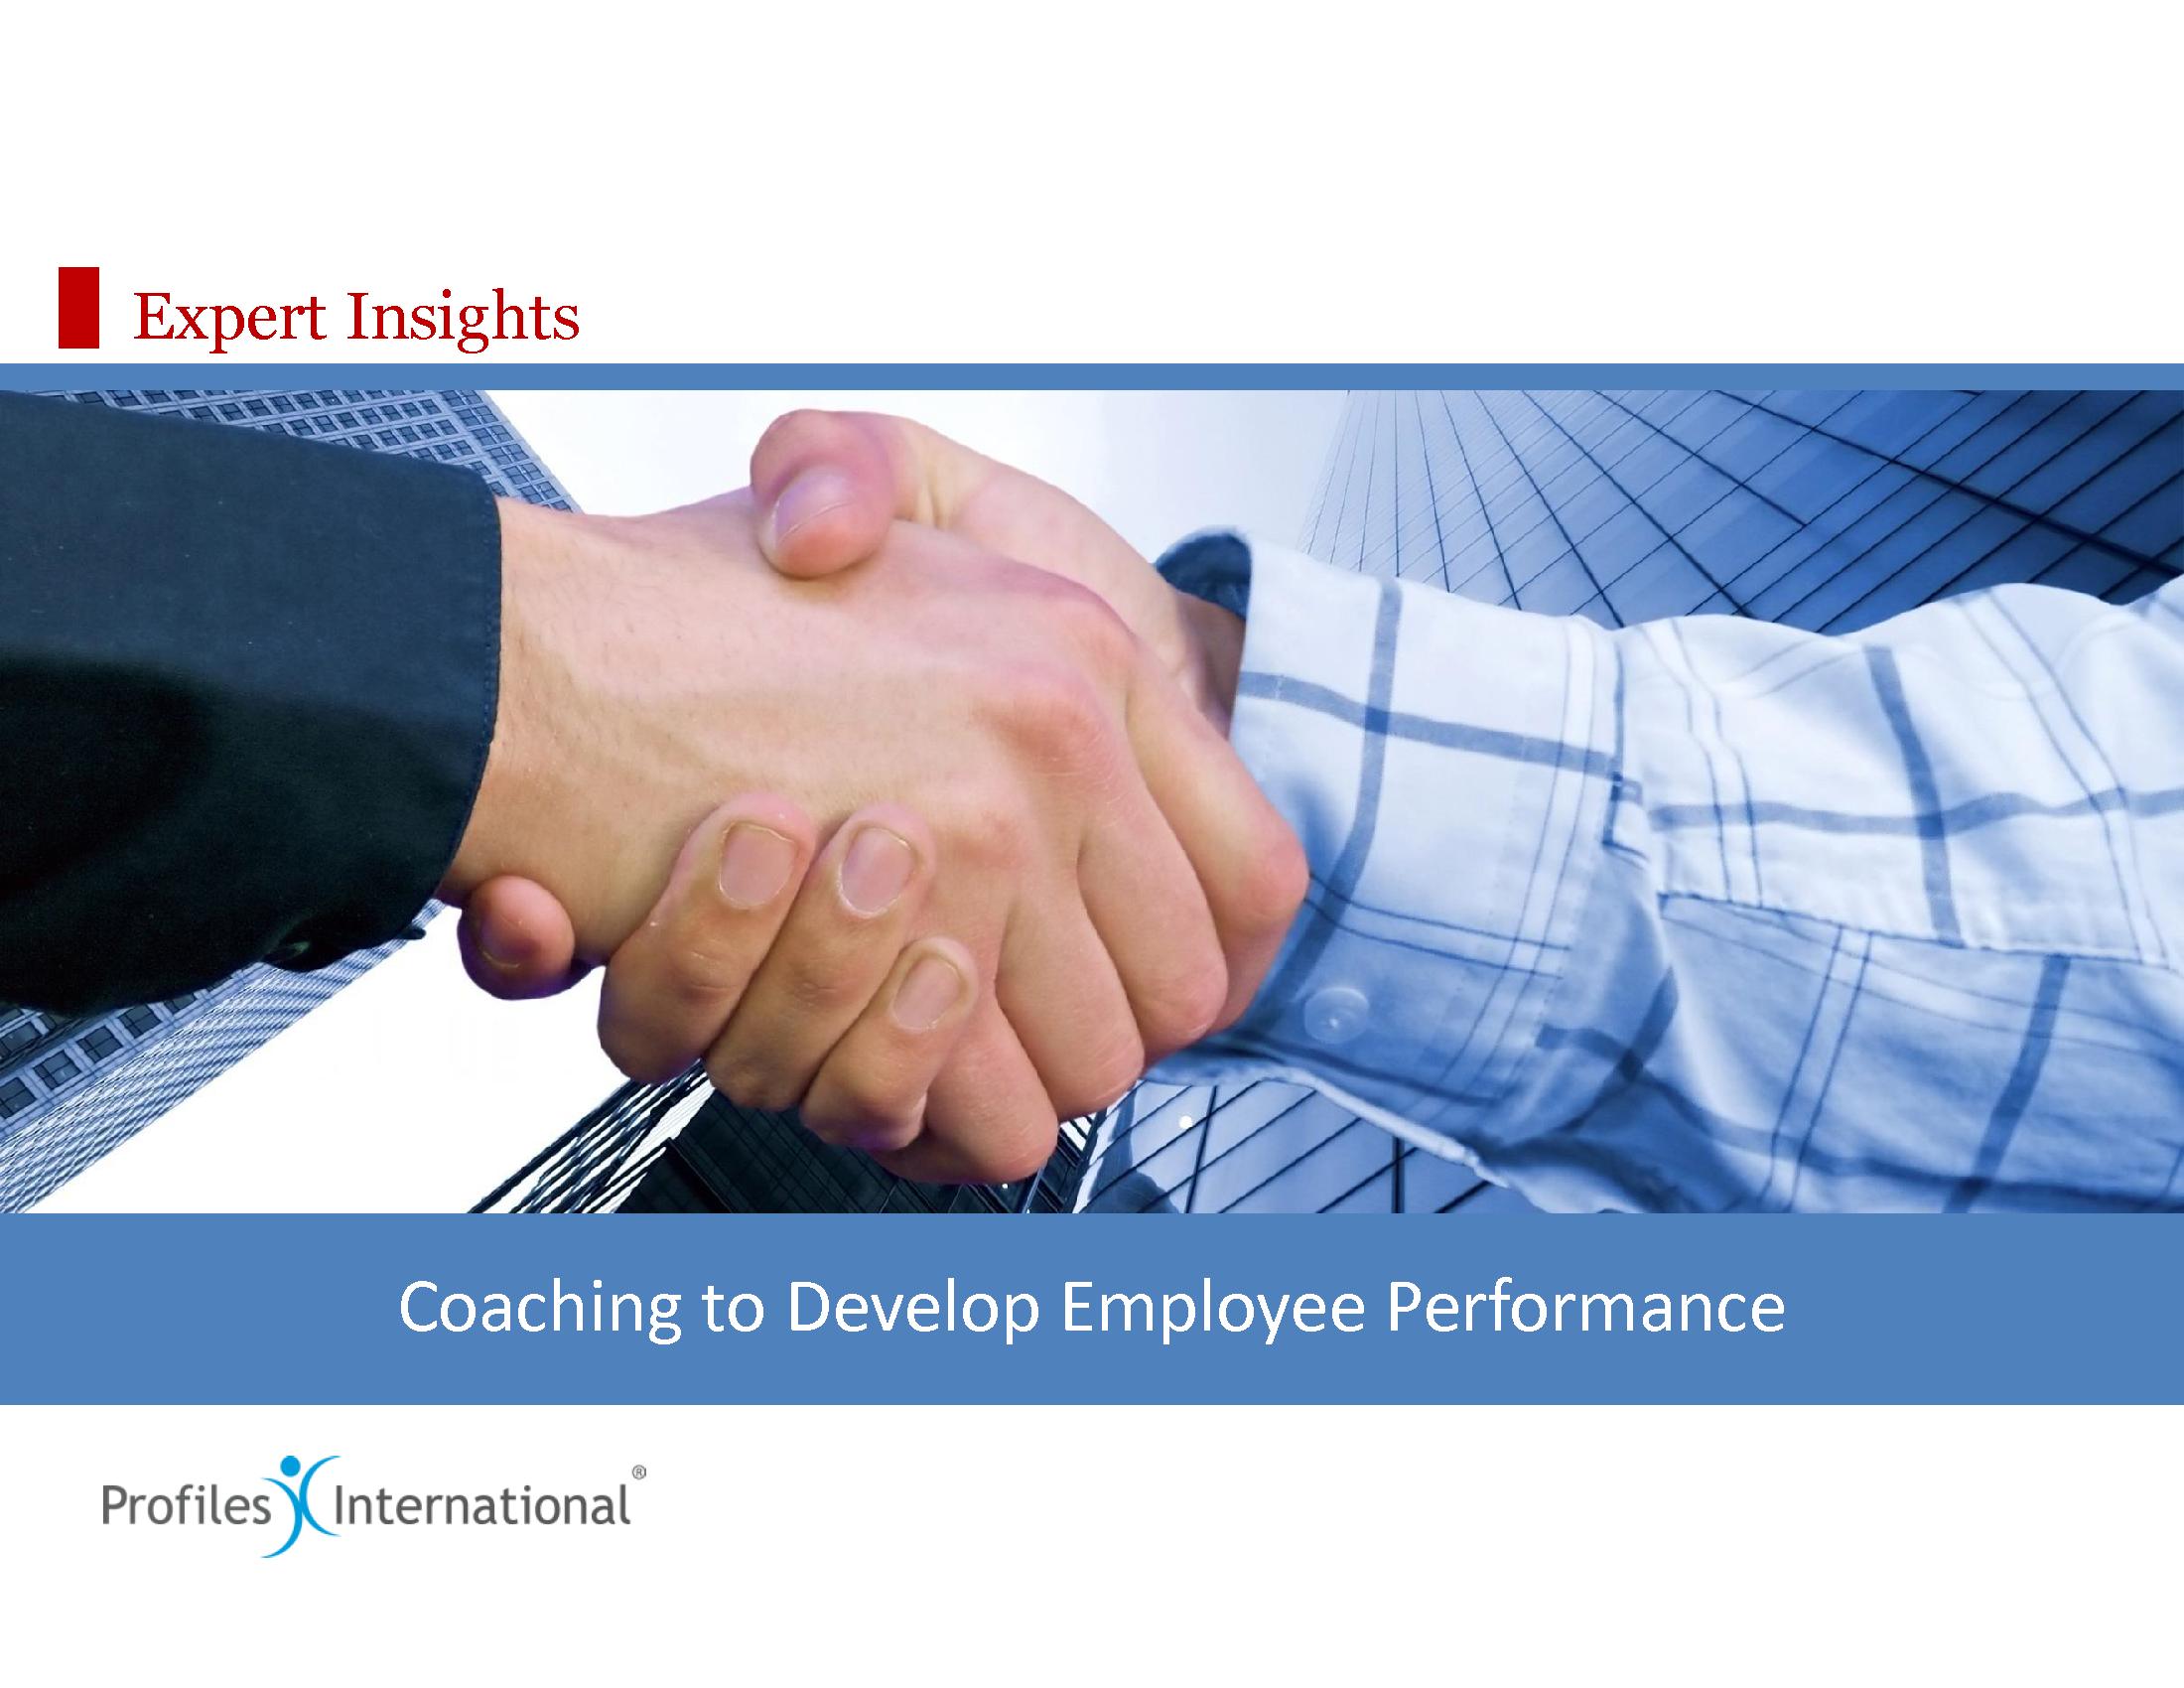 07-Coaching to Develop Employee Performance